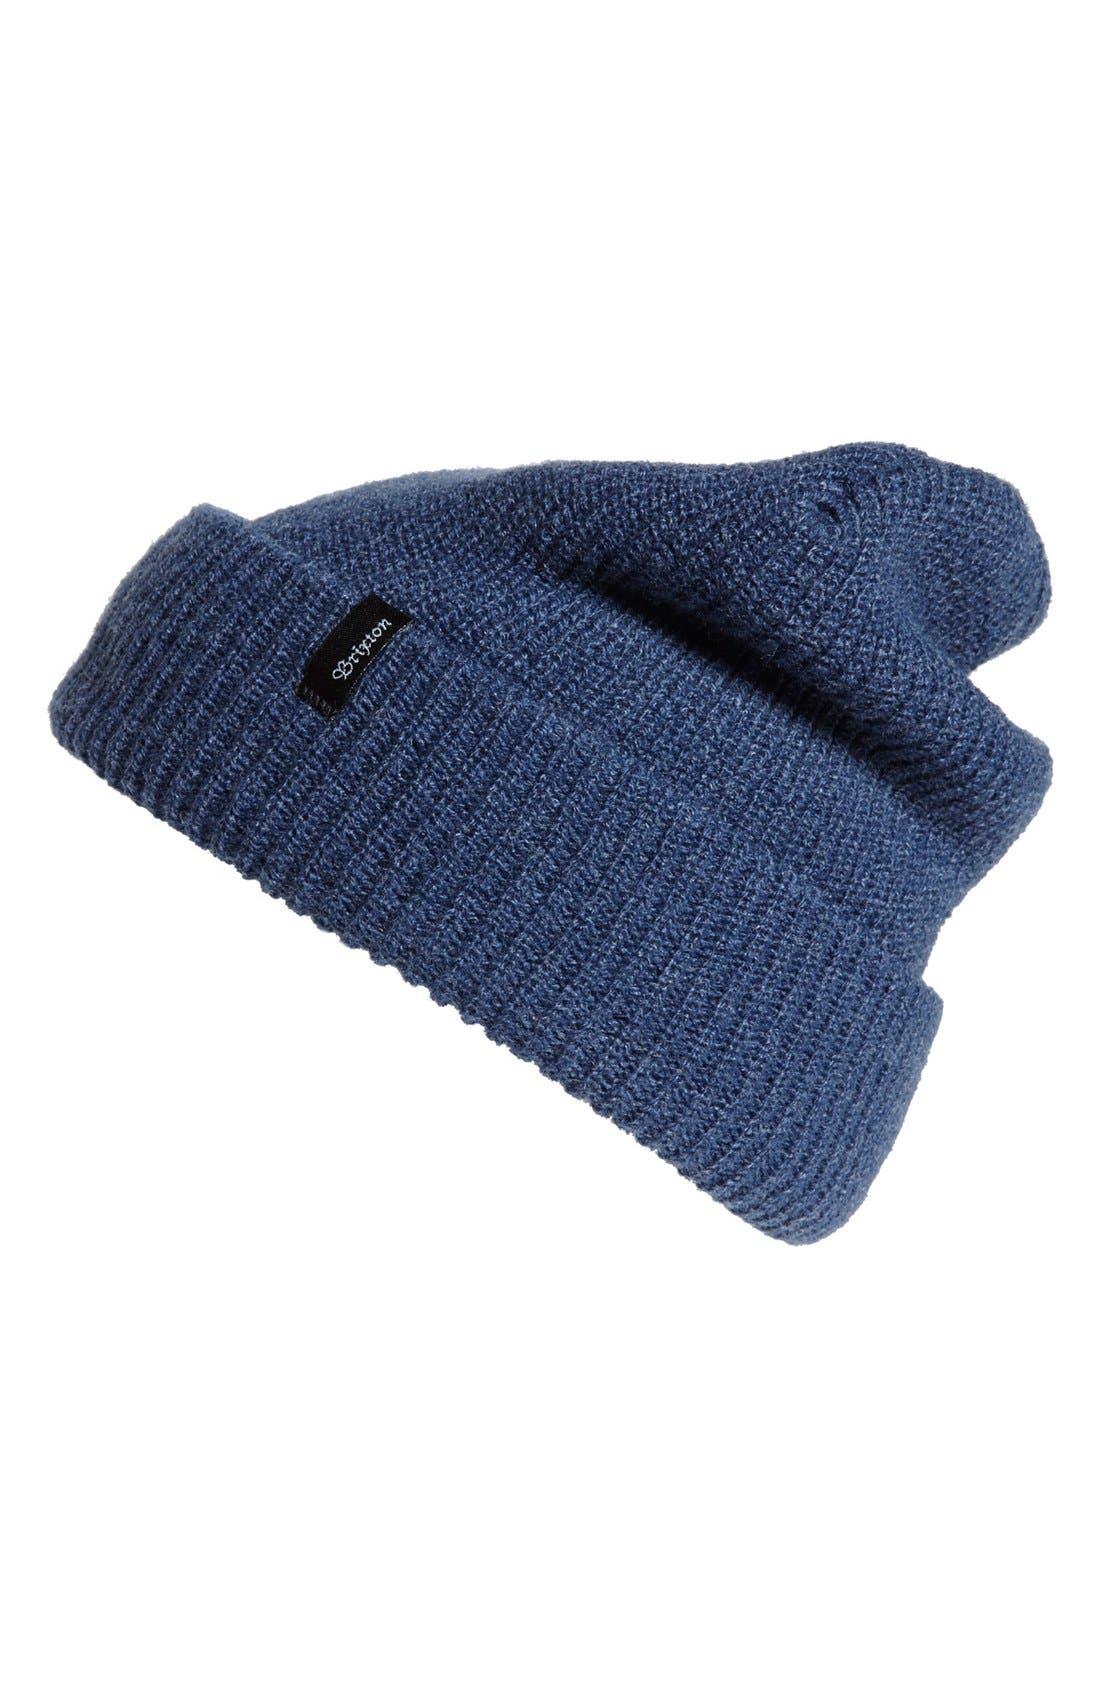 'Heist' Rib Knit Cap,                             Main thumbnail 9, color,